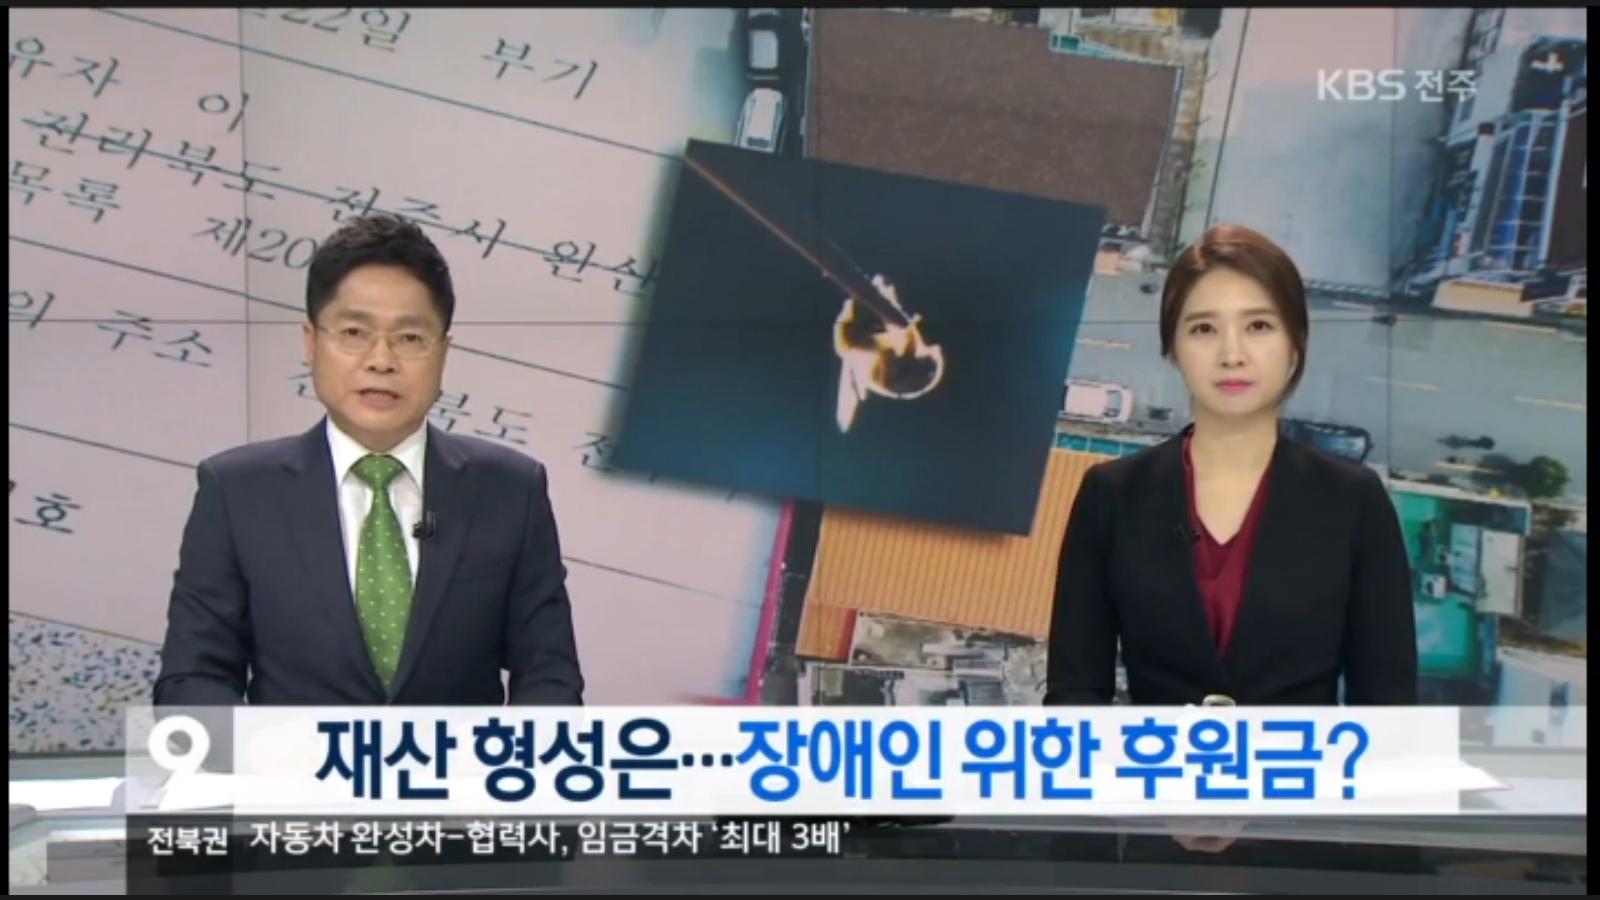 [18.3.30 KBS전주] 전주 봉침게이트, 재산 형성은..후원금검찰 사건축소..재수사 해야1.jpg